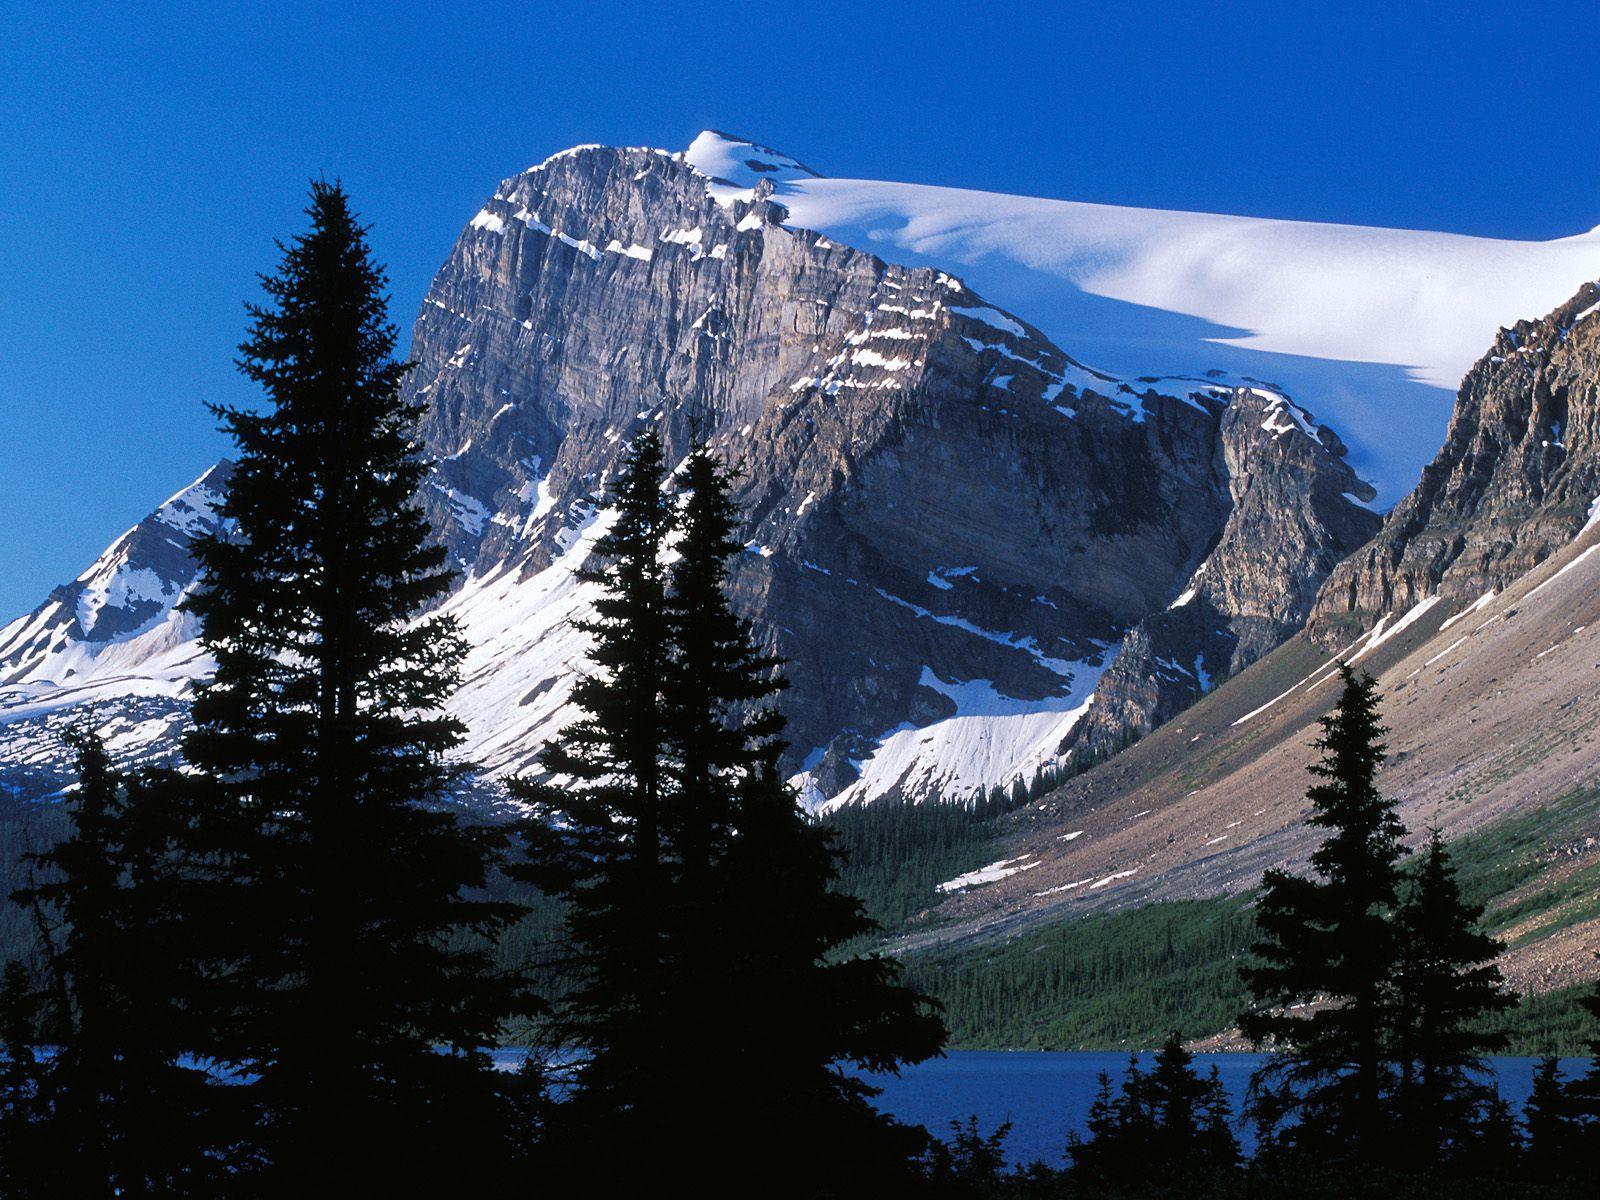 Mountain Peak Canada Wallpapers HD Wallpapers 1600x1200